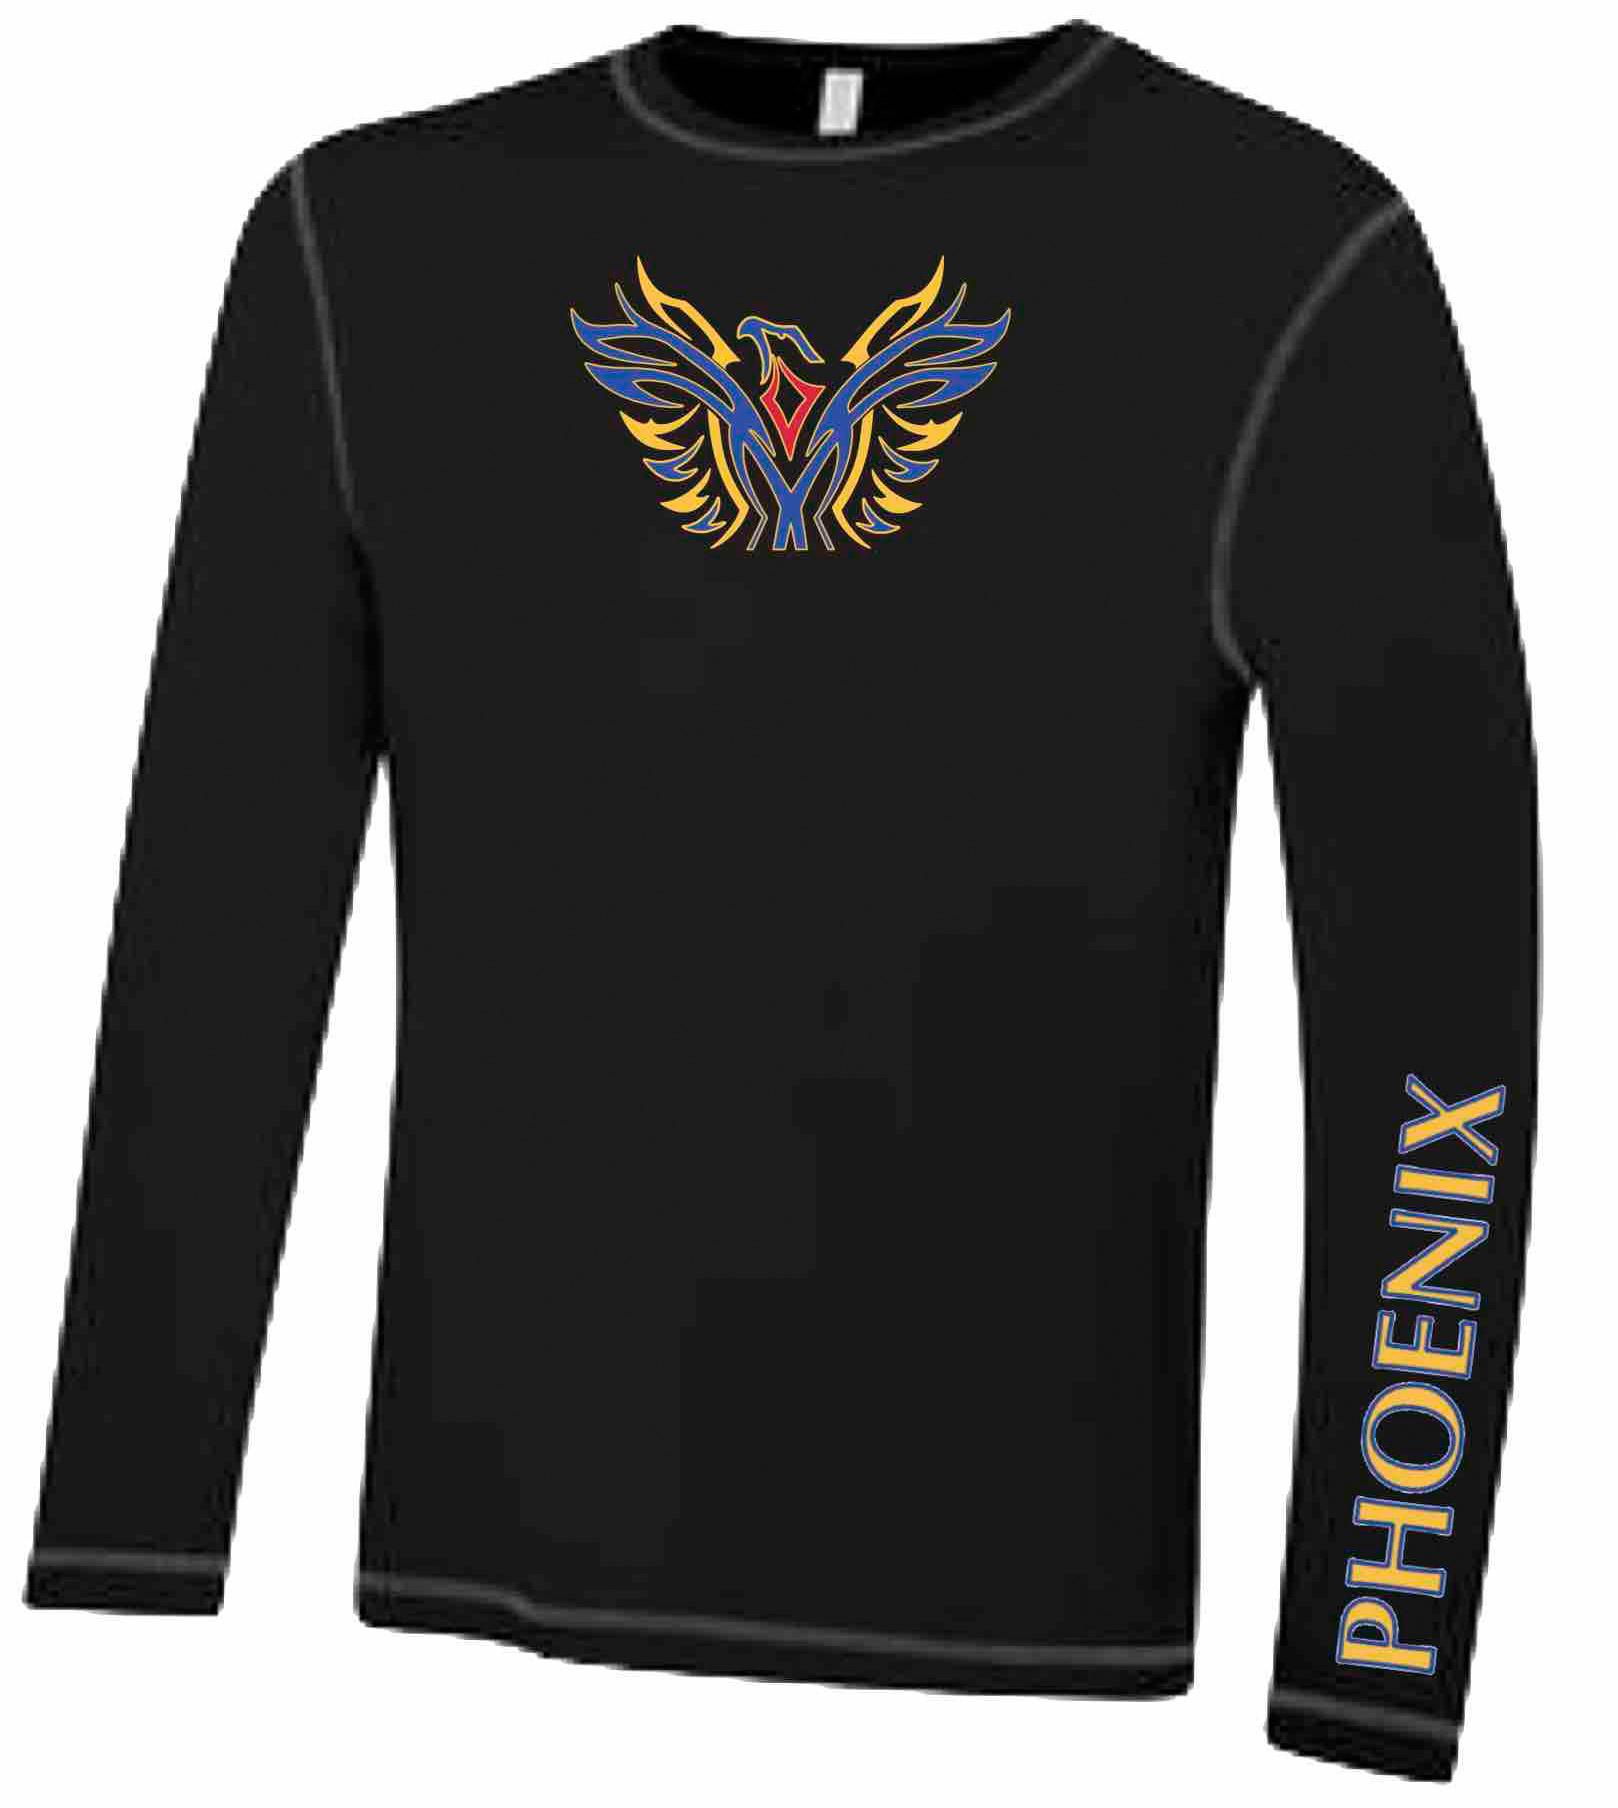 BLACK - Ultra Soft Long Sleeve Technical Shirt